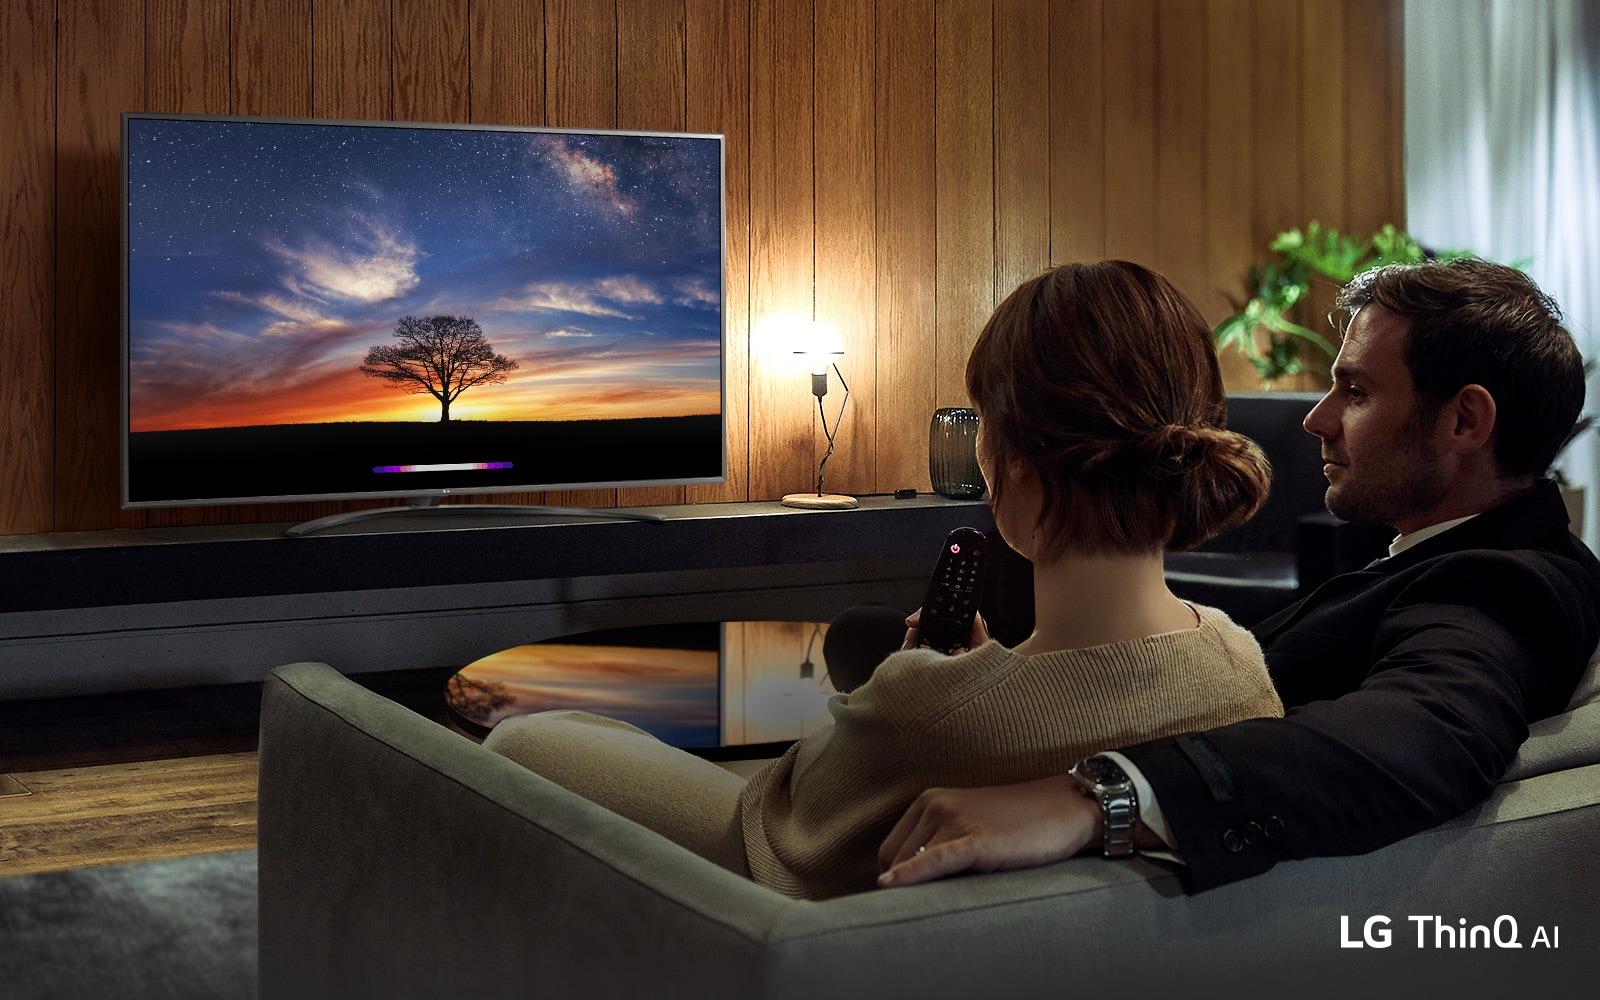 TV-UHD-UM76-01-AI-ThinQ-Desktop-17042019